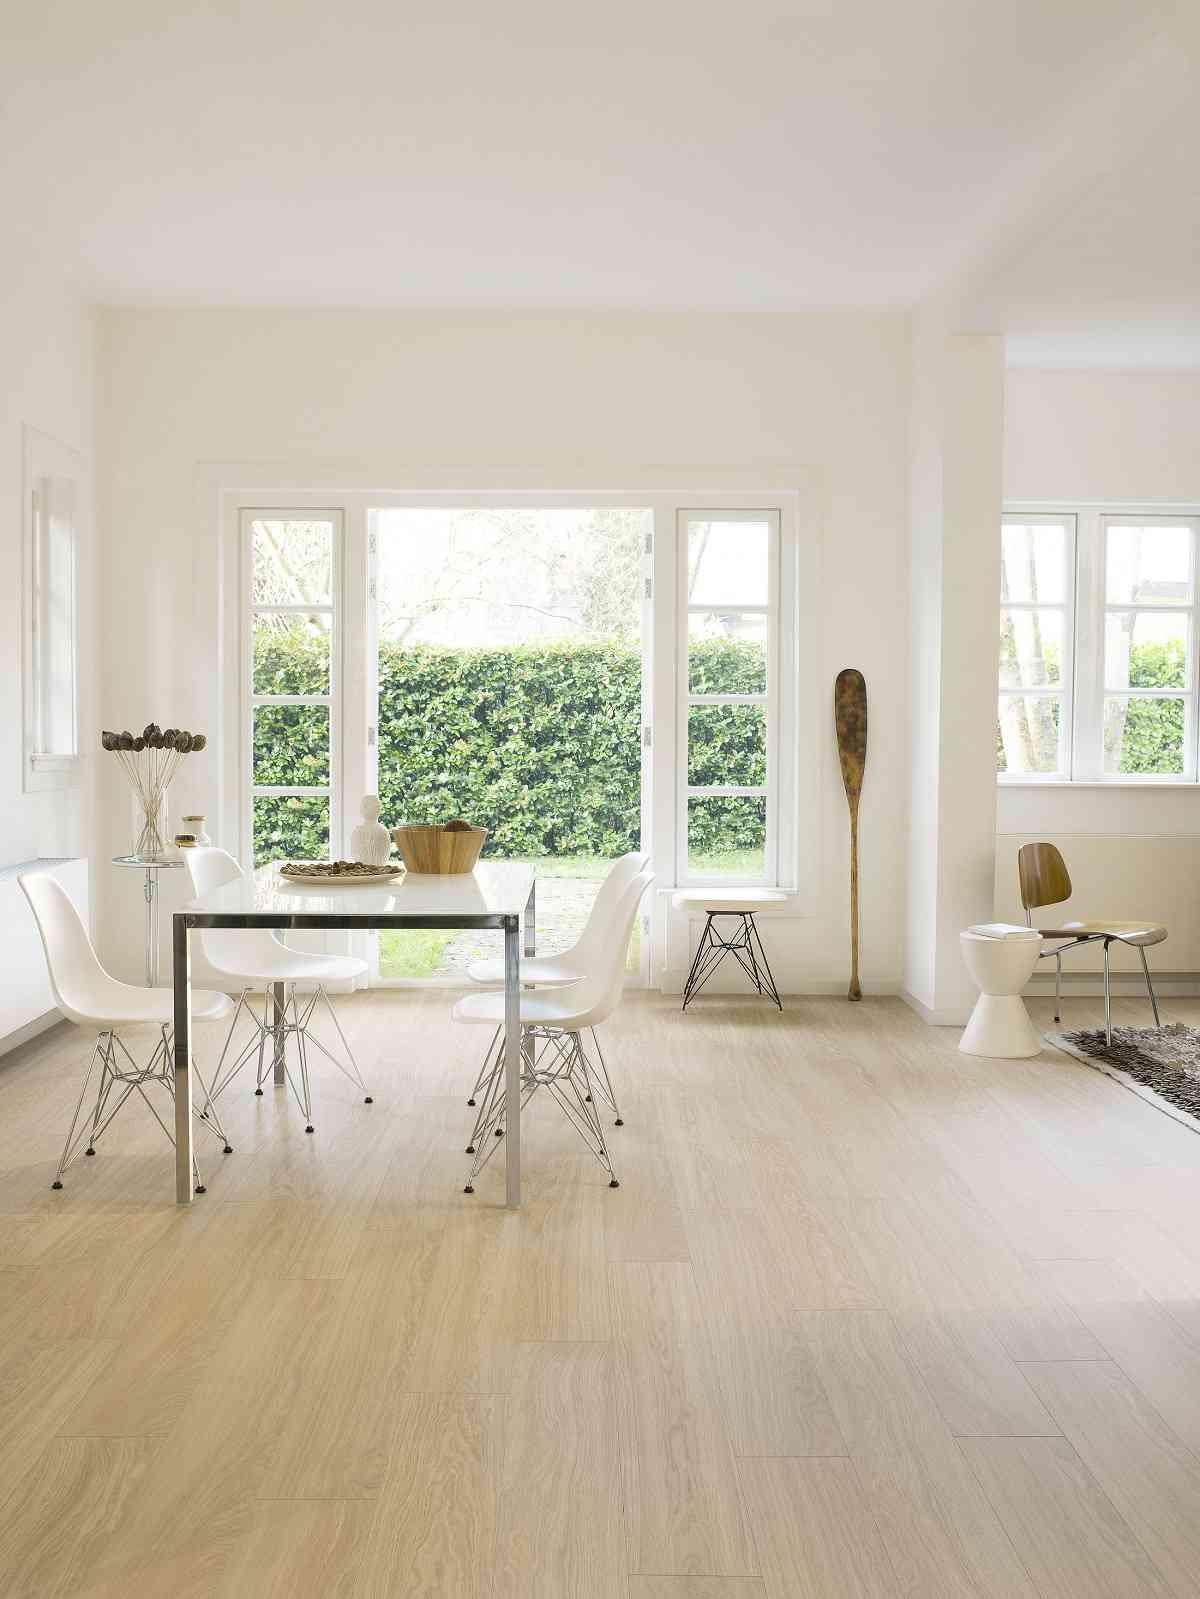 5 ideas para transformar tu hogar en un espacio luminoso for Revista ideas para tu hogar